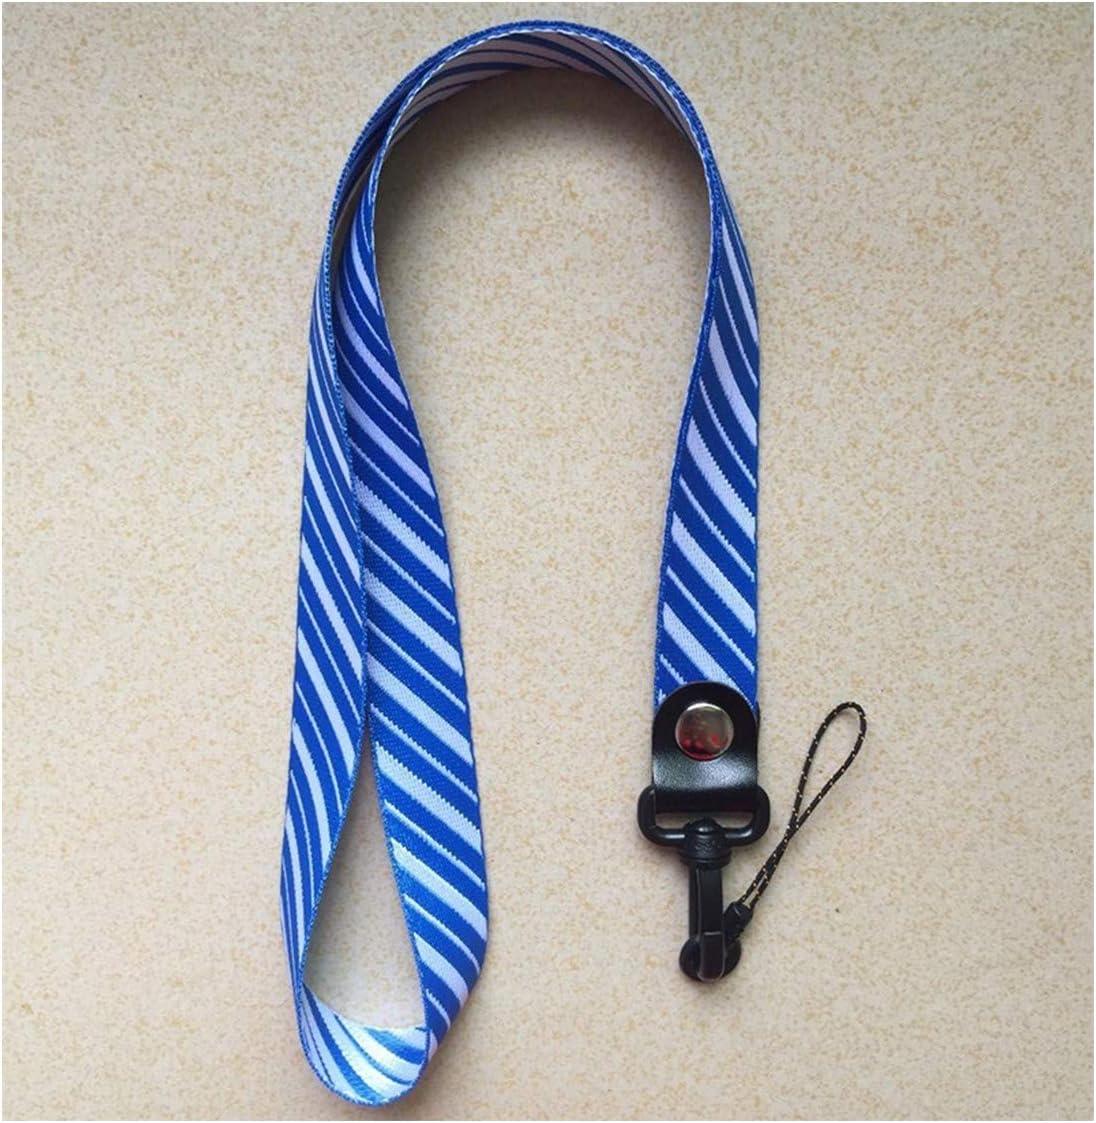 Twill Mobile Phone Straps Lanyard for Key ID Cardk Strap USB Badge Holder Hang Rope Lanyard Anti Fall Lanyard,Yellow